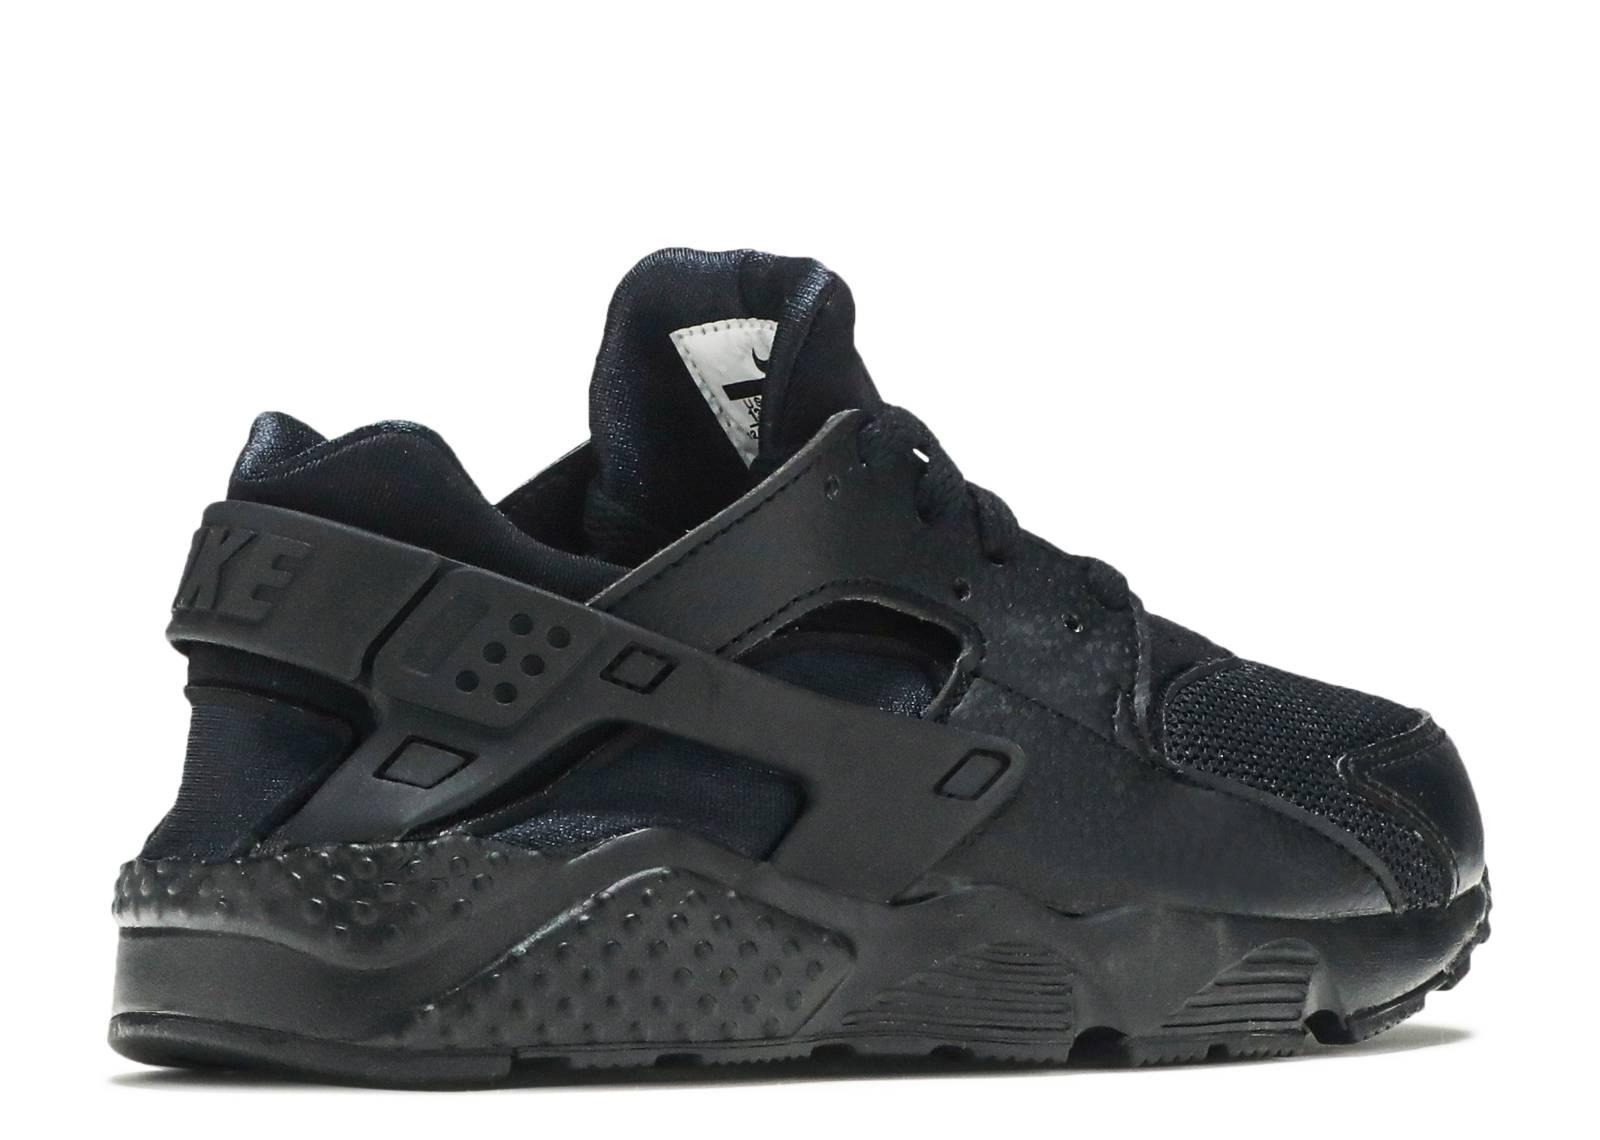 info for 7f206 9c354 Nike Huarache Run Ps - Nike - 704949 016 - black-black-black   Flight Club